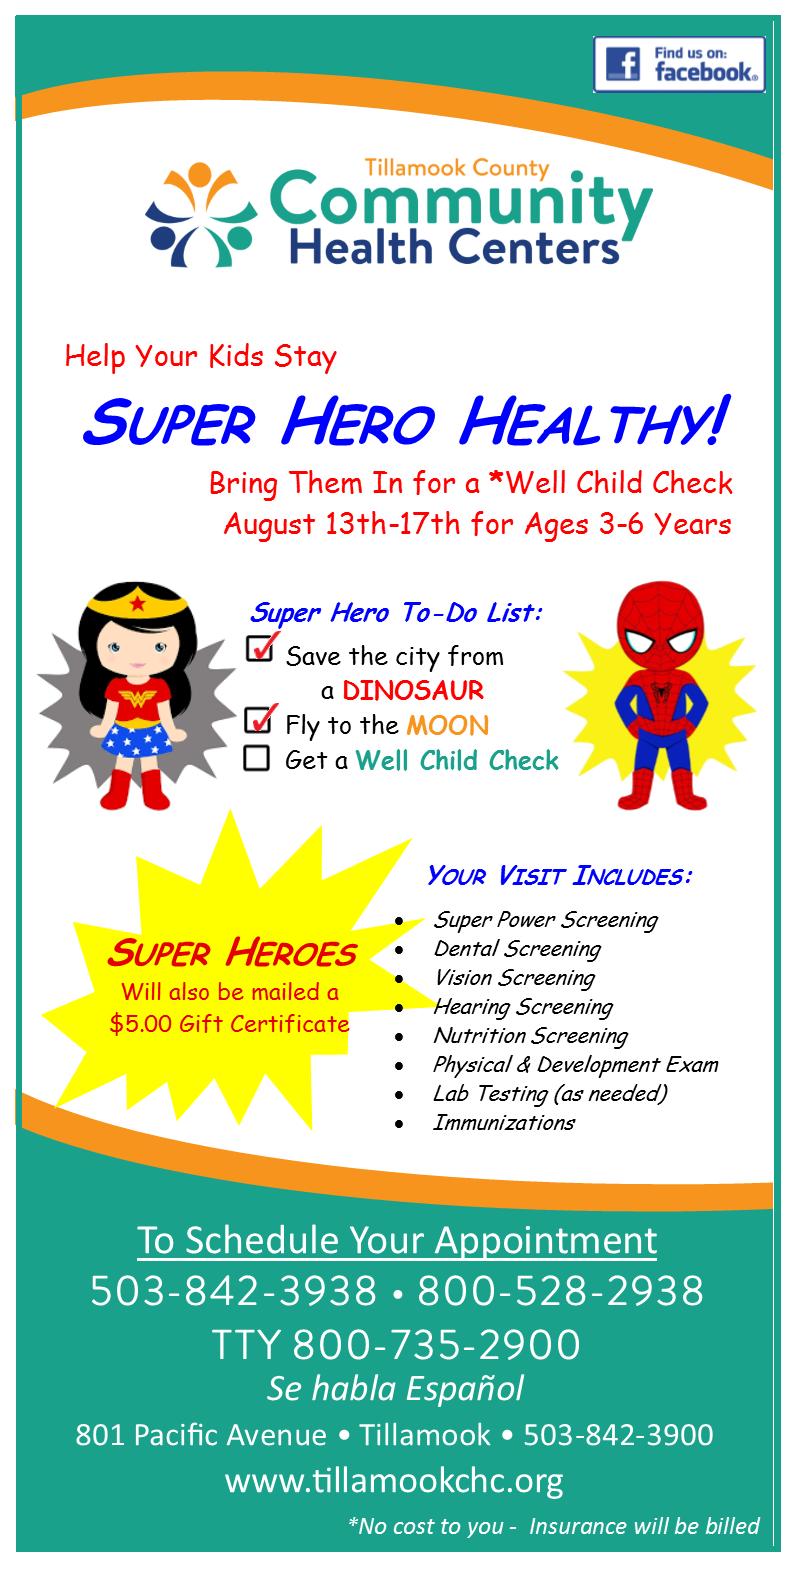 Wcc 3 16 Aug 13 17 Super Hero Tillamook County Community